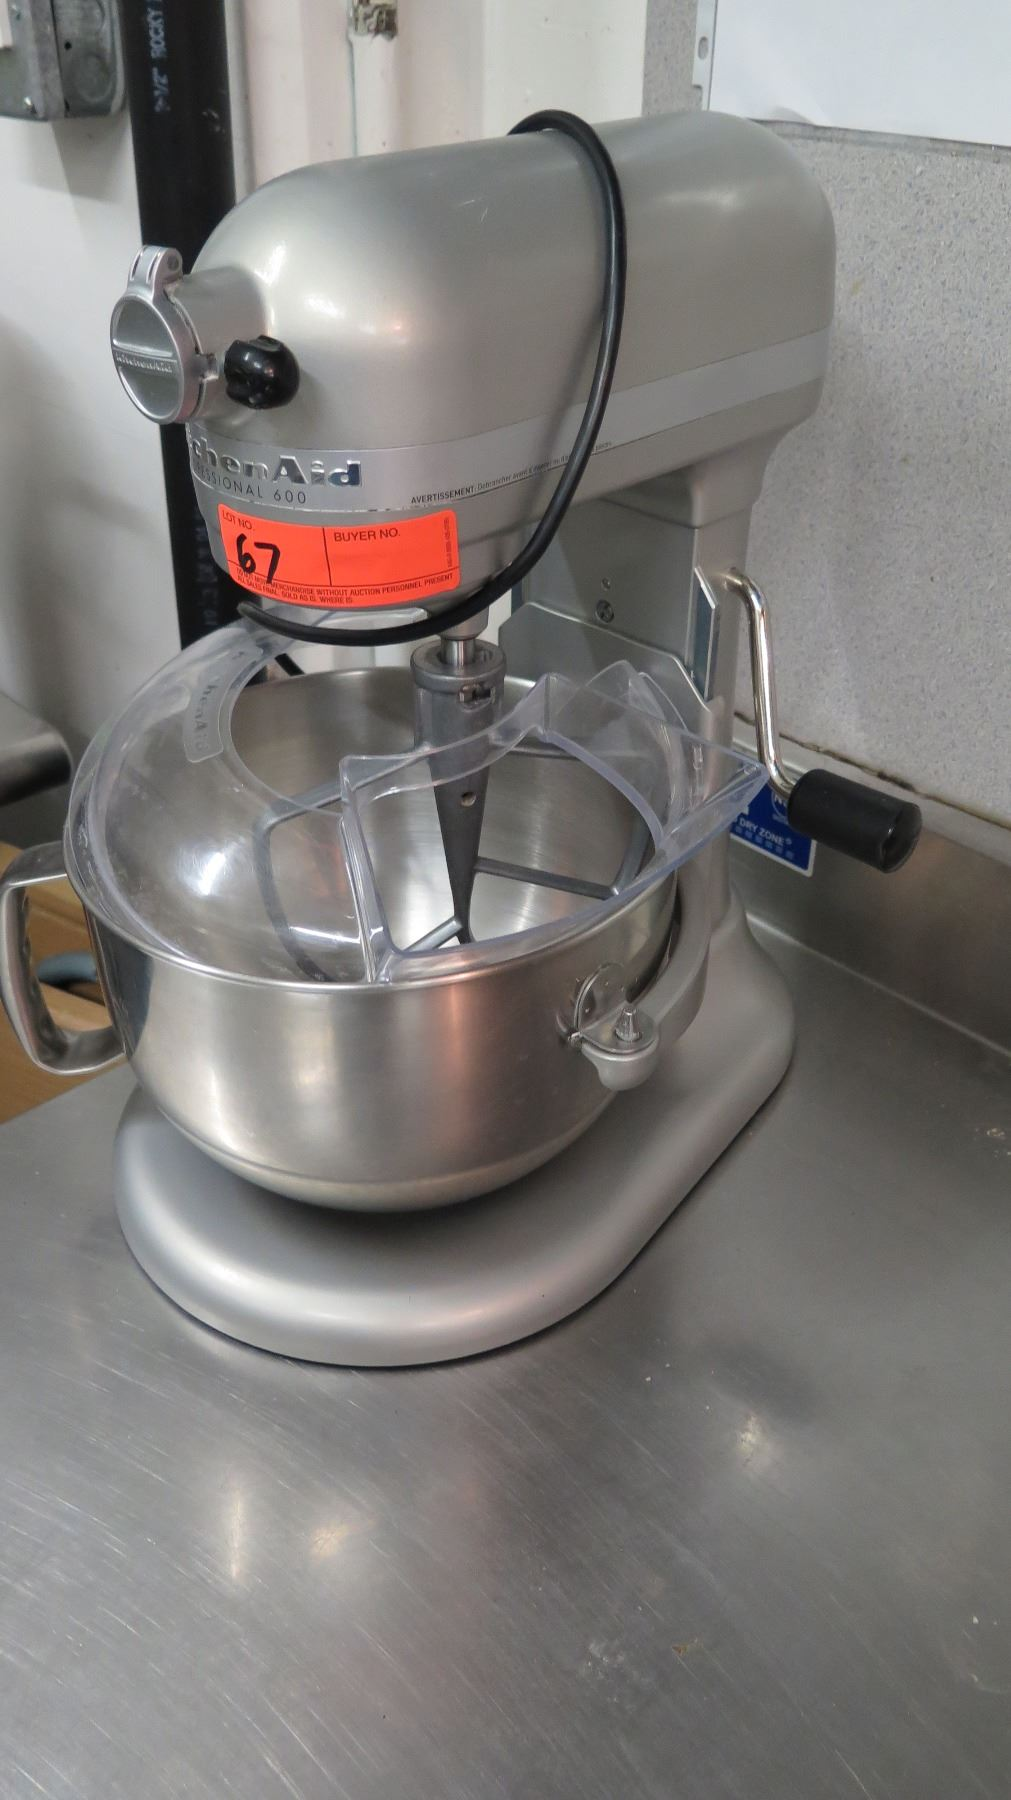 Kitchenaid Professional 600 Stand Mixer - Oahu Auctions